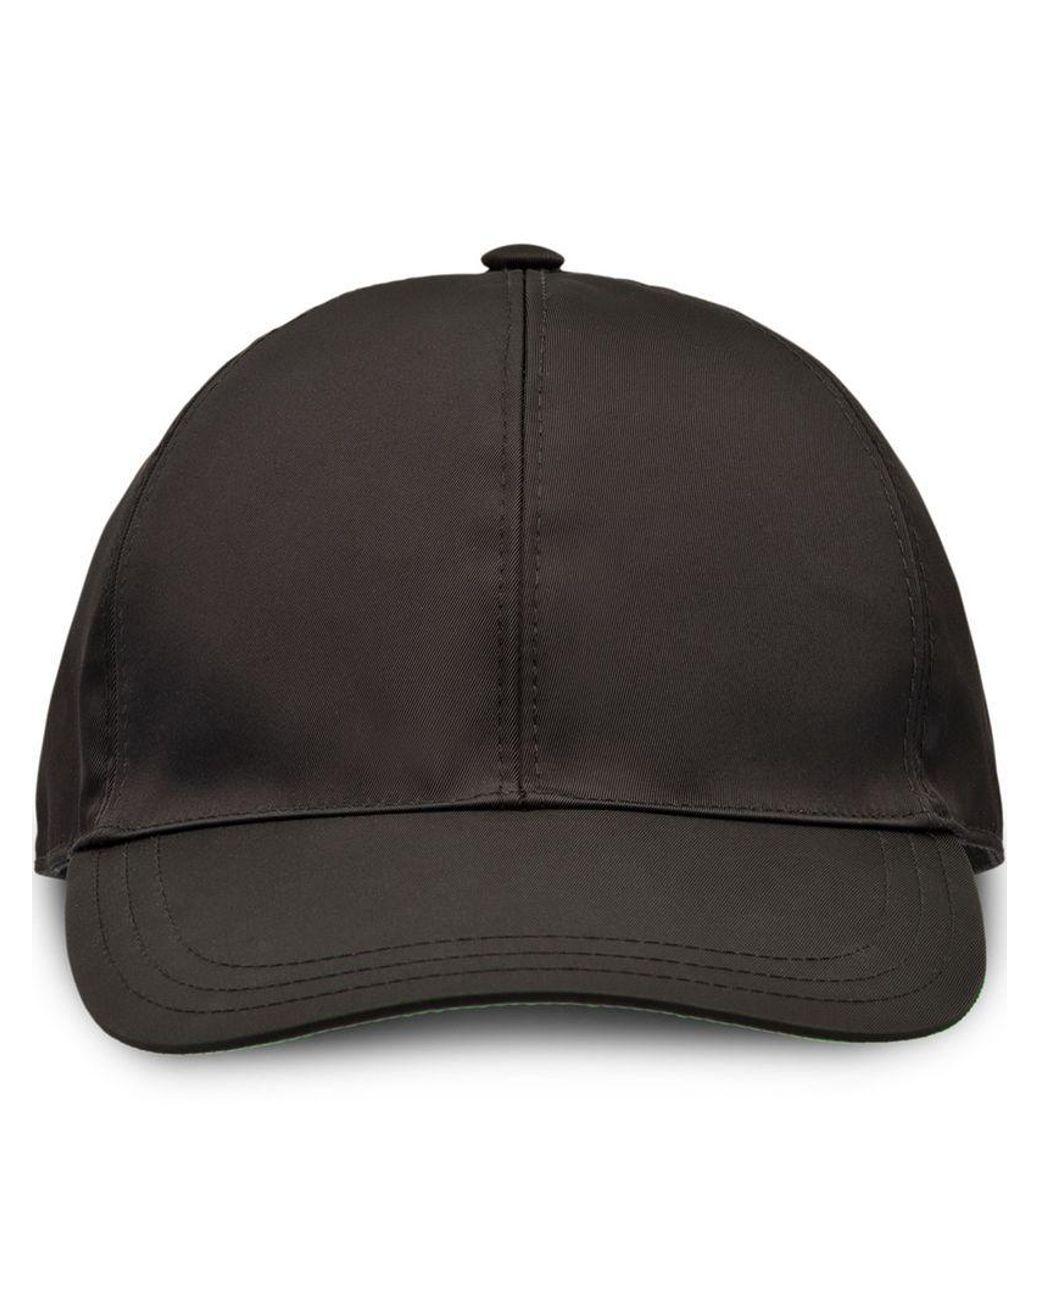 ce035c01 Prada Nylon Baseball Cap in Black for Men - Save 30% - Lyst